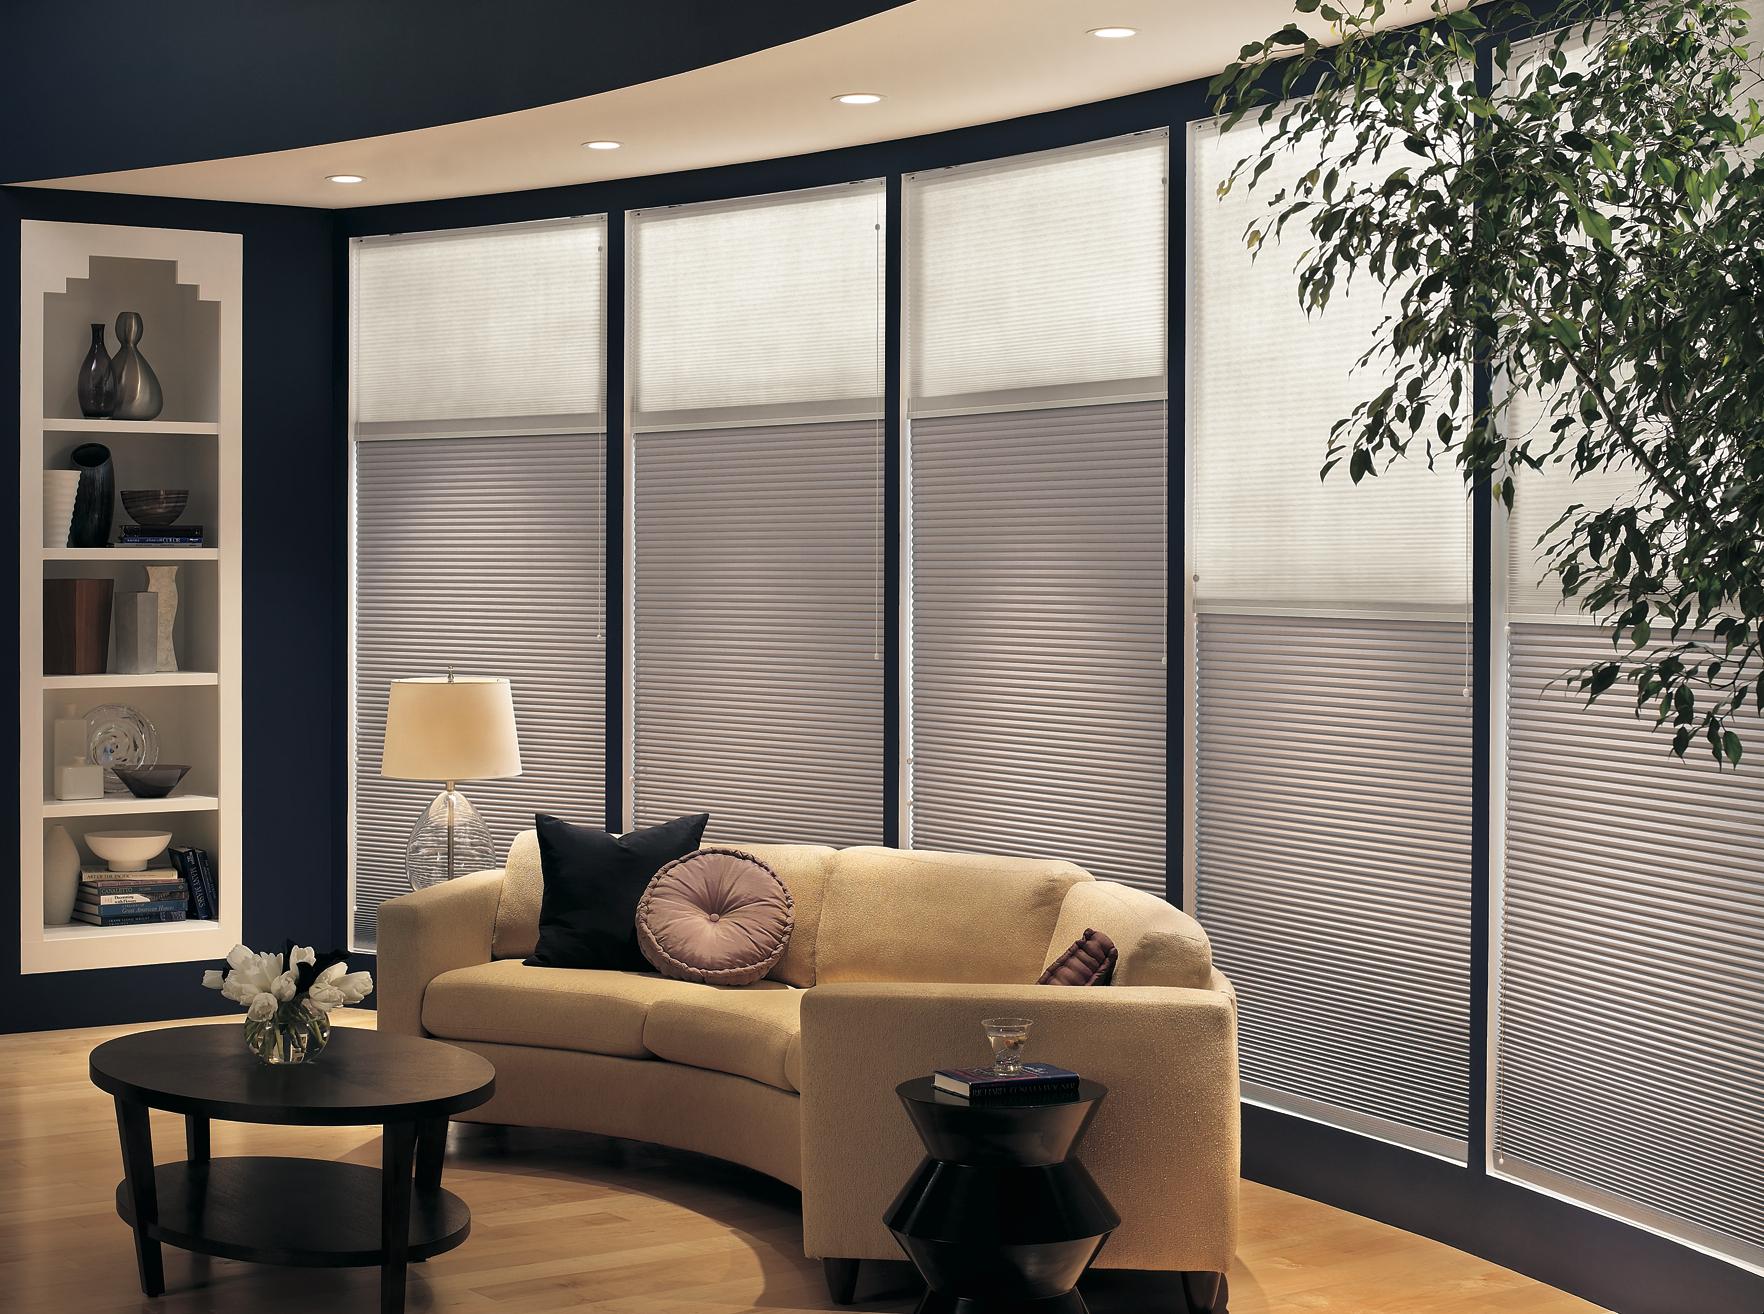 Bamboo bathroom flooring - Day Amp Night Cellular Shades From Blindsgalore Com